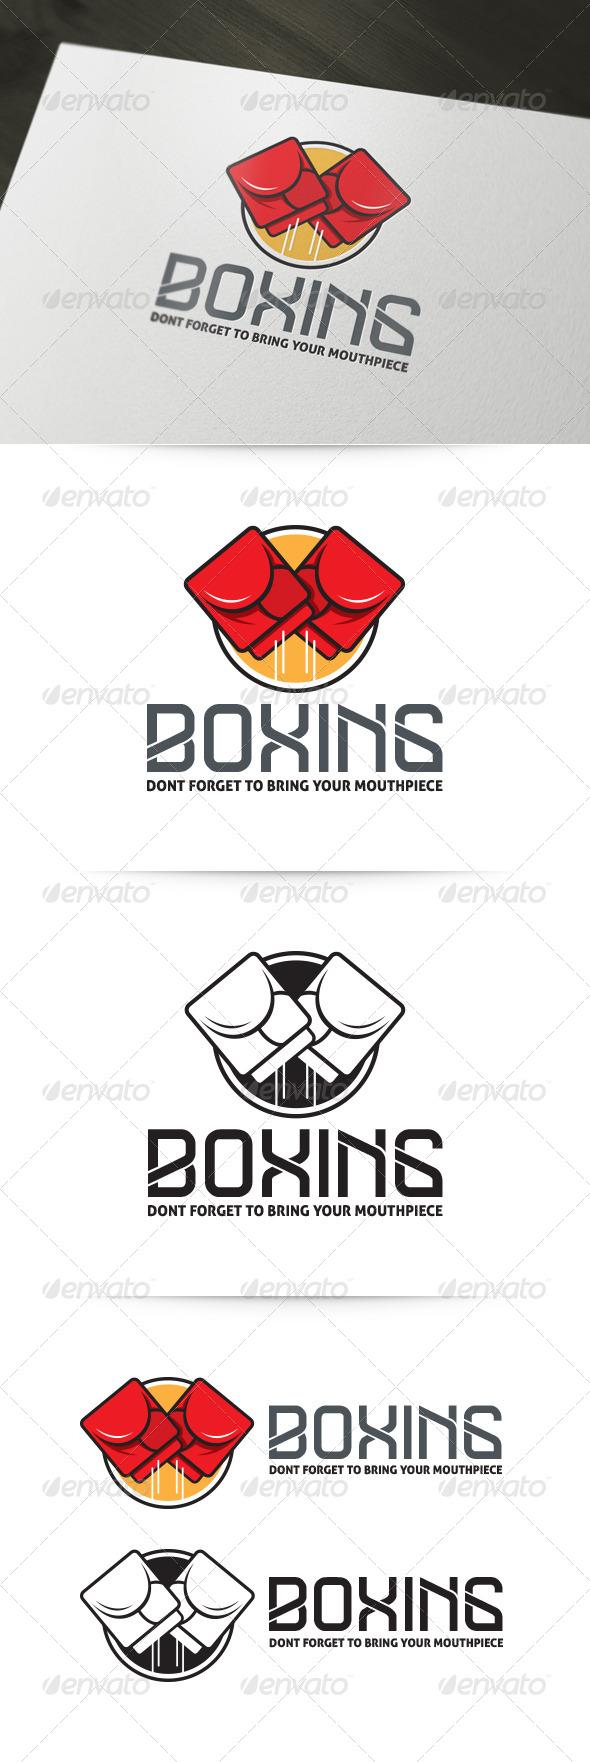 GraphicRiver Boxing Logo 5702869